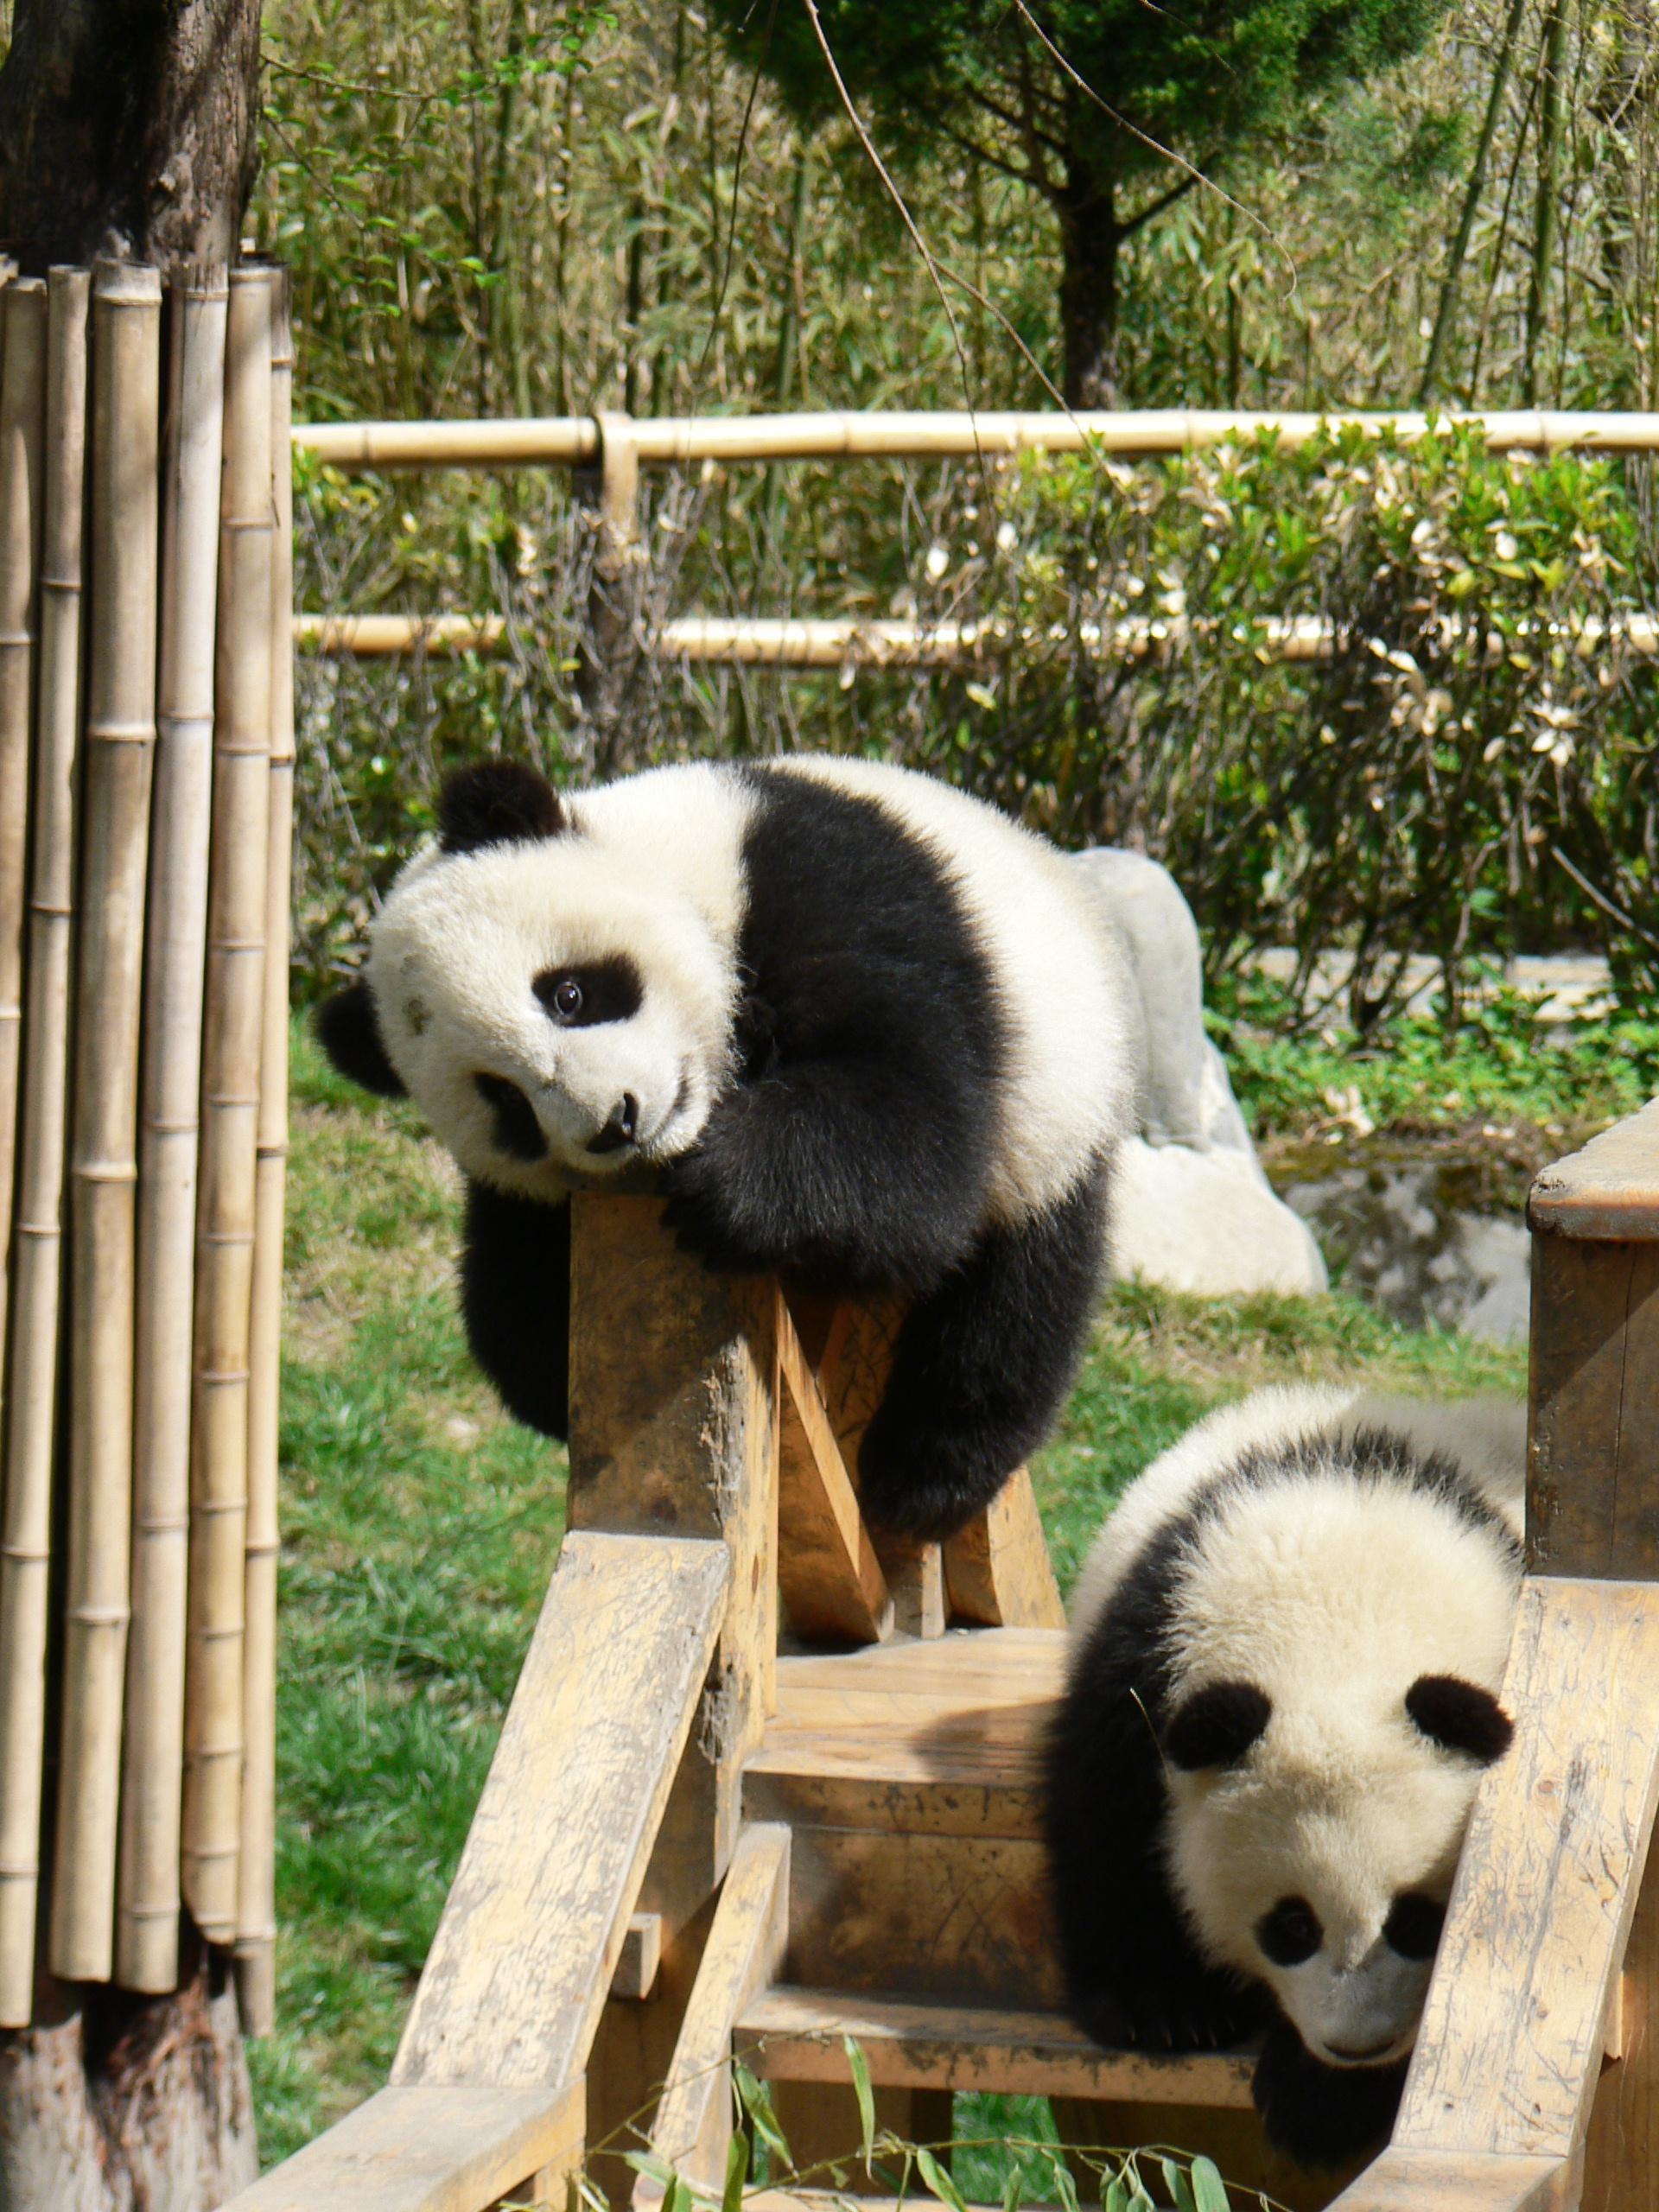 Wolong panda nursery